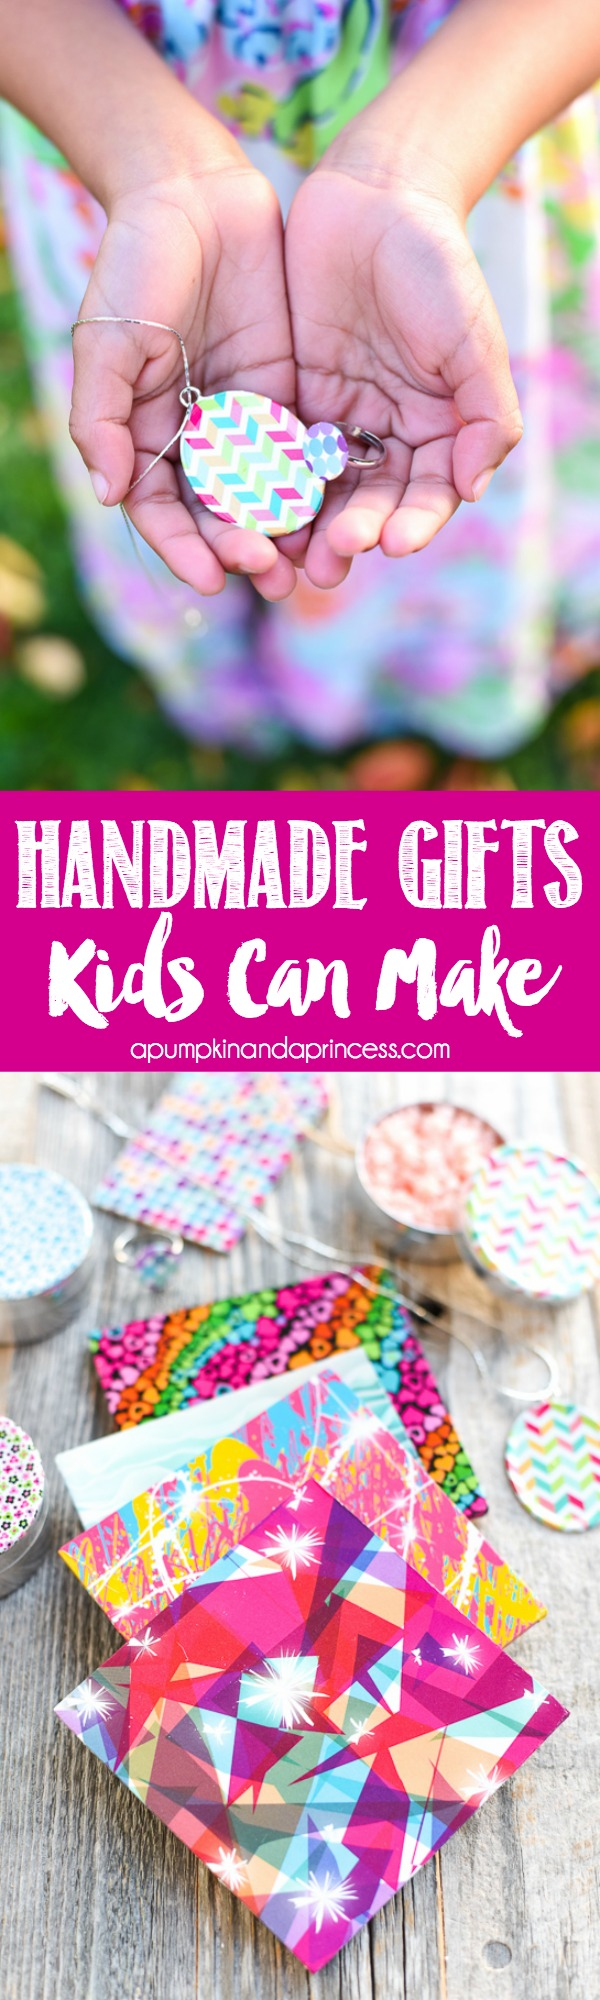 Handmade Gifts Kids Can Make - easy DIY gift ideas